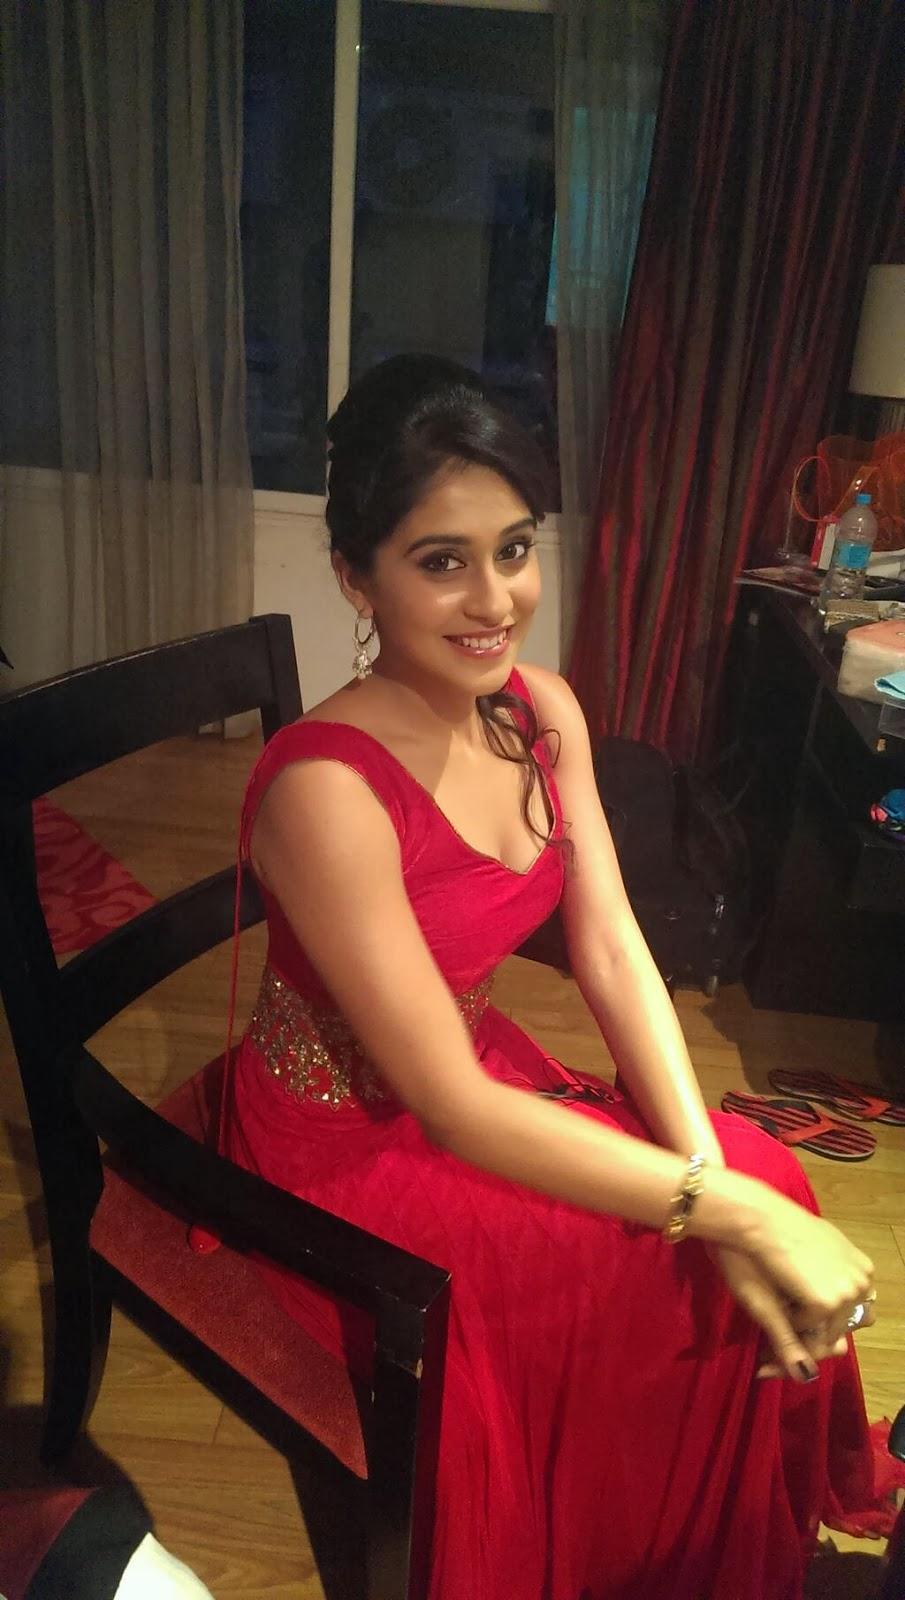 Hd Wallpaper Little Girls Wedding Actress Regina Rare Personal Pics Hot Photos In Saree